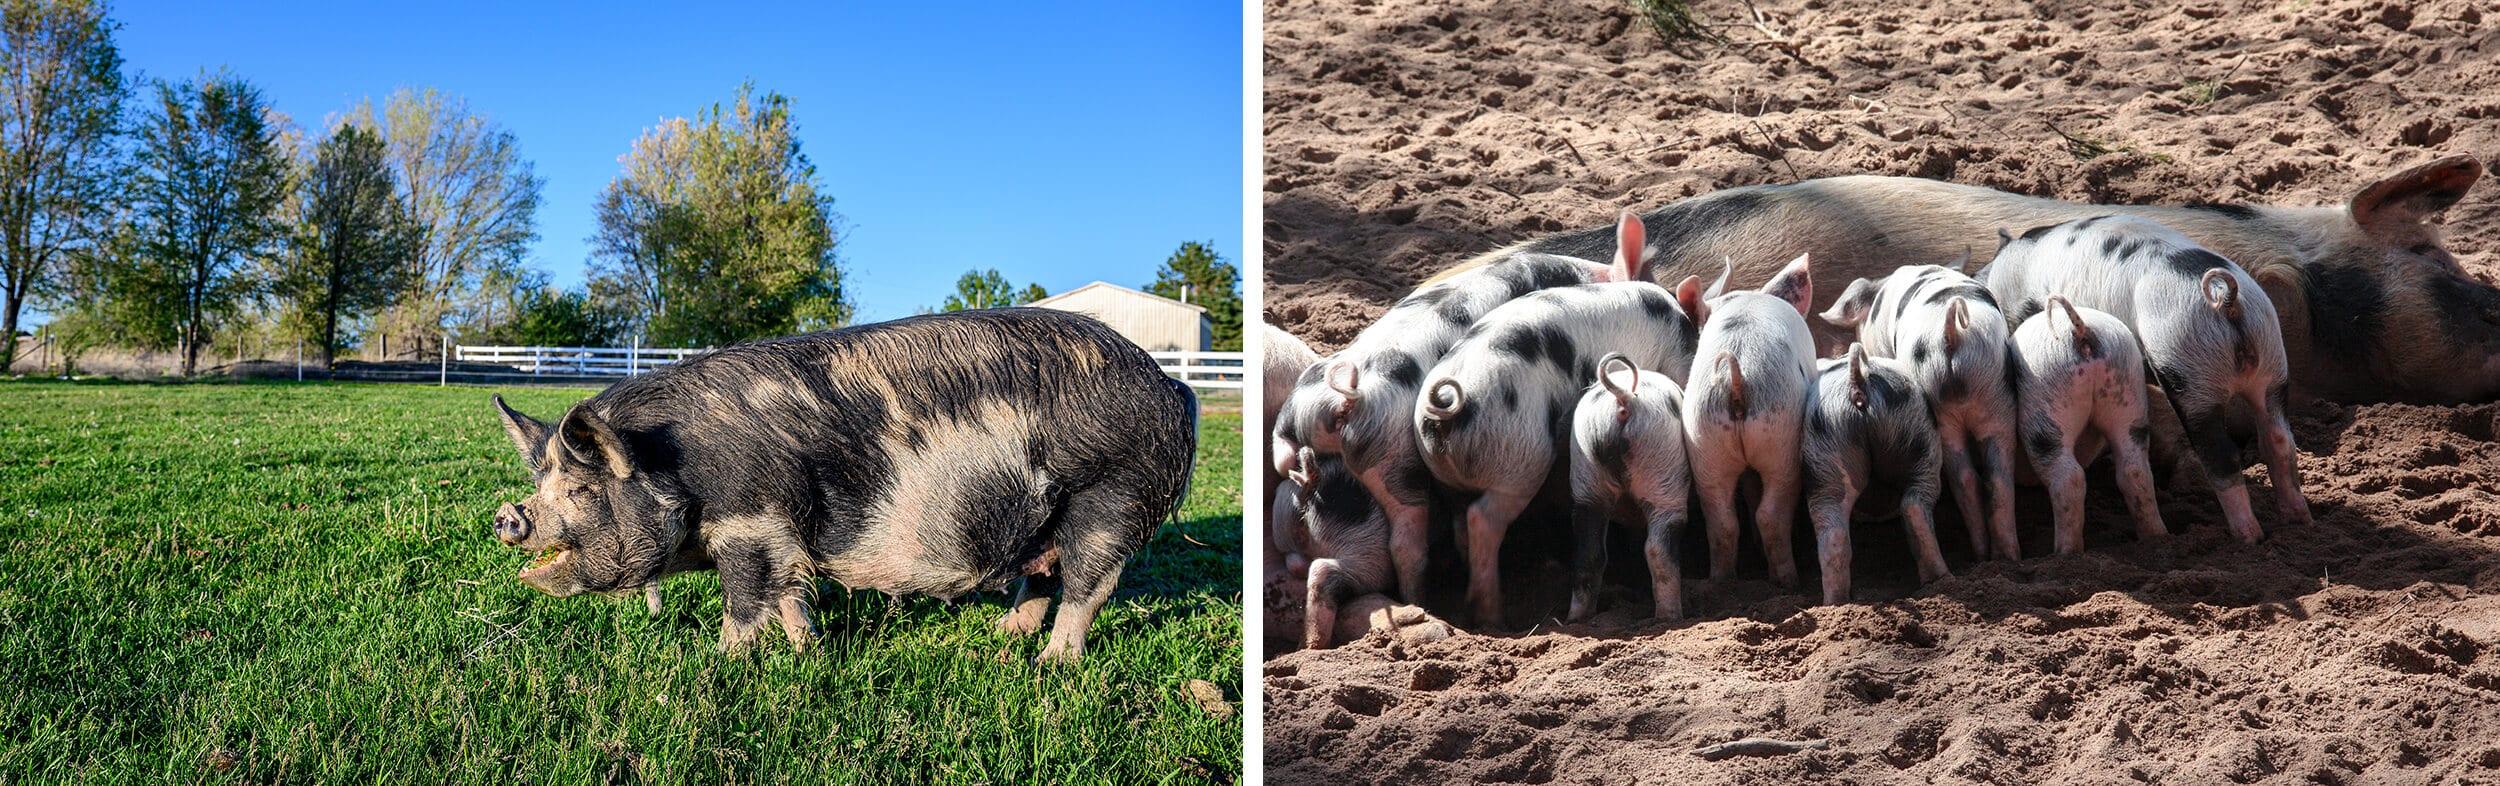 prevent swine diseases from birds